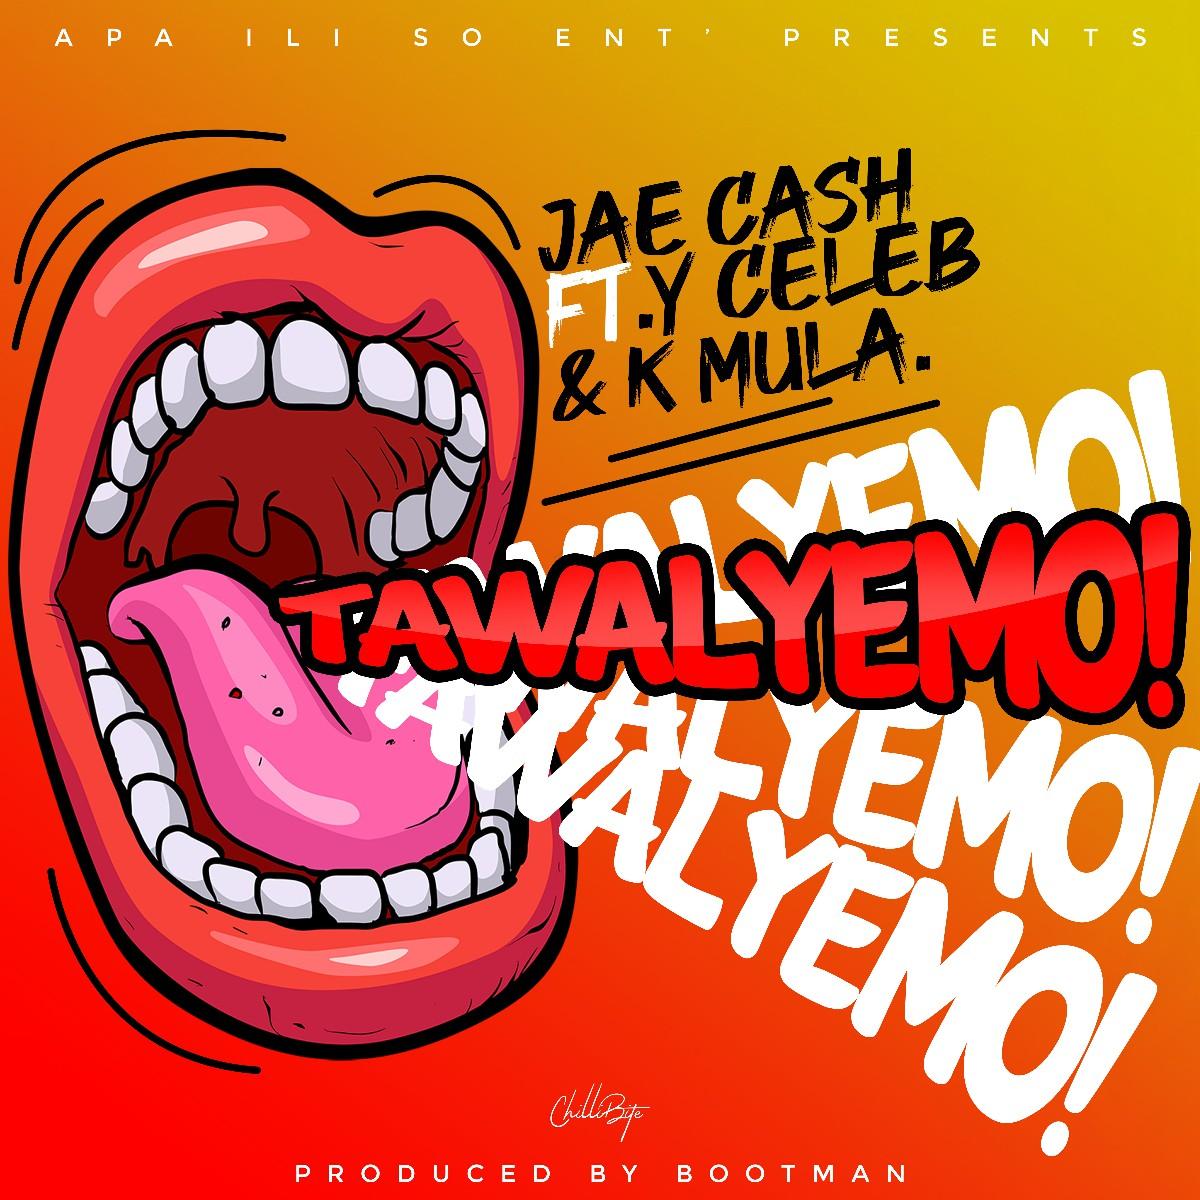 Jae Cash ft. Y Celeb & K Mula - Tawalyemo, Like W.T.F